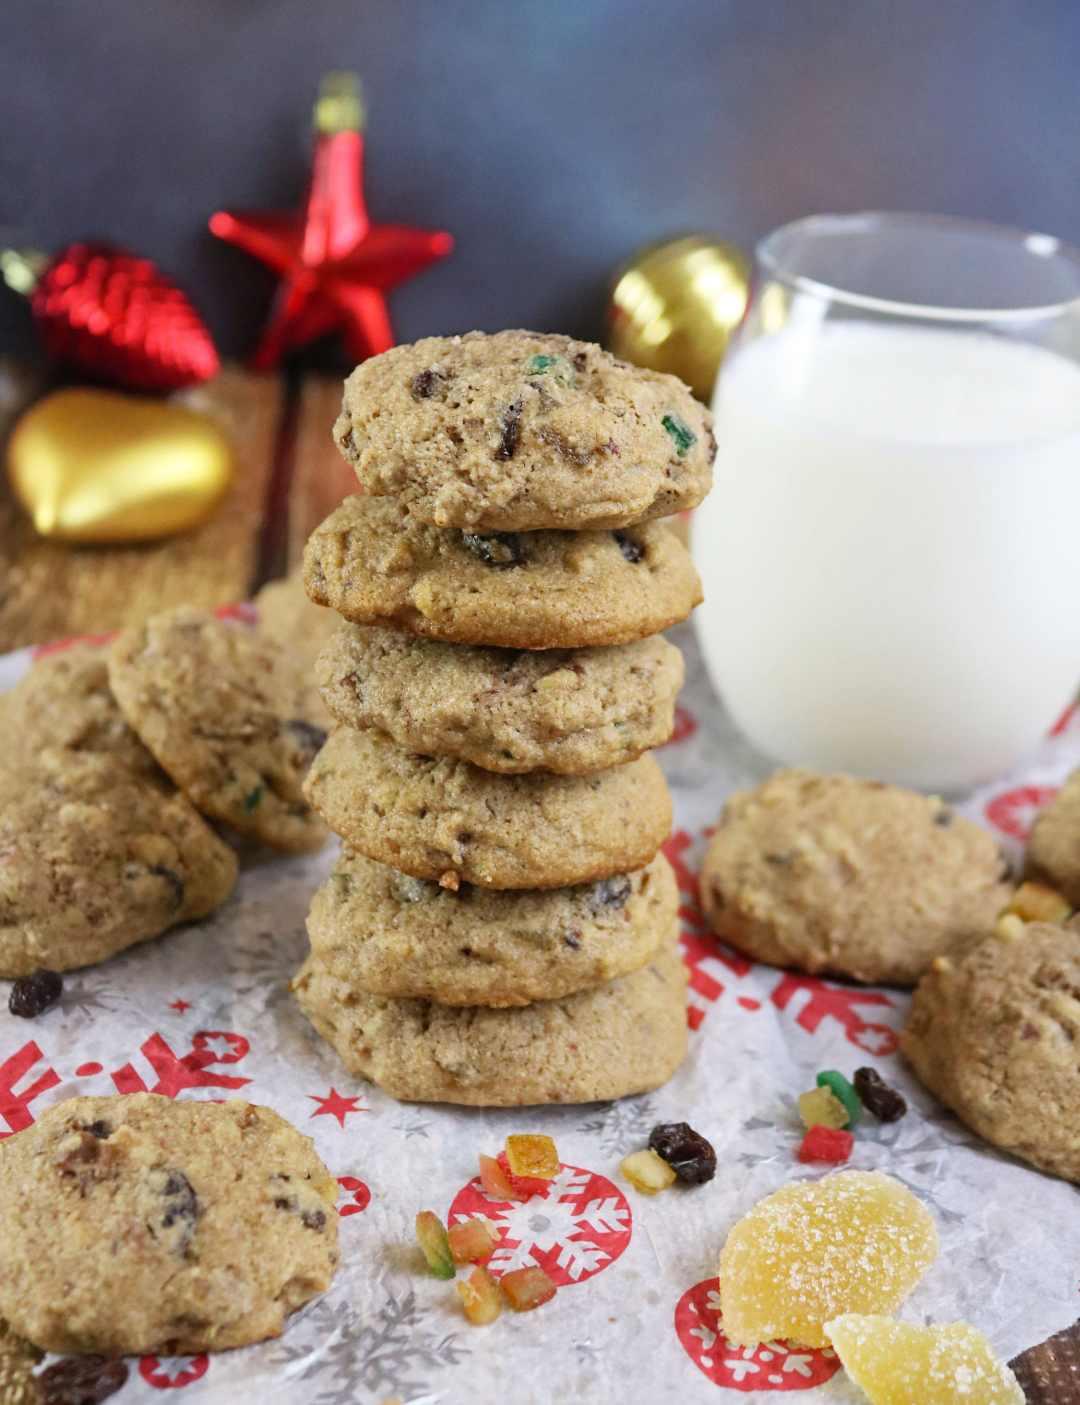 SriLankan-Christmas-Cake-Cookies-GlutenFree